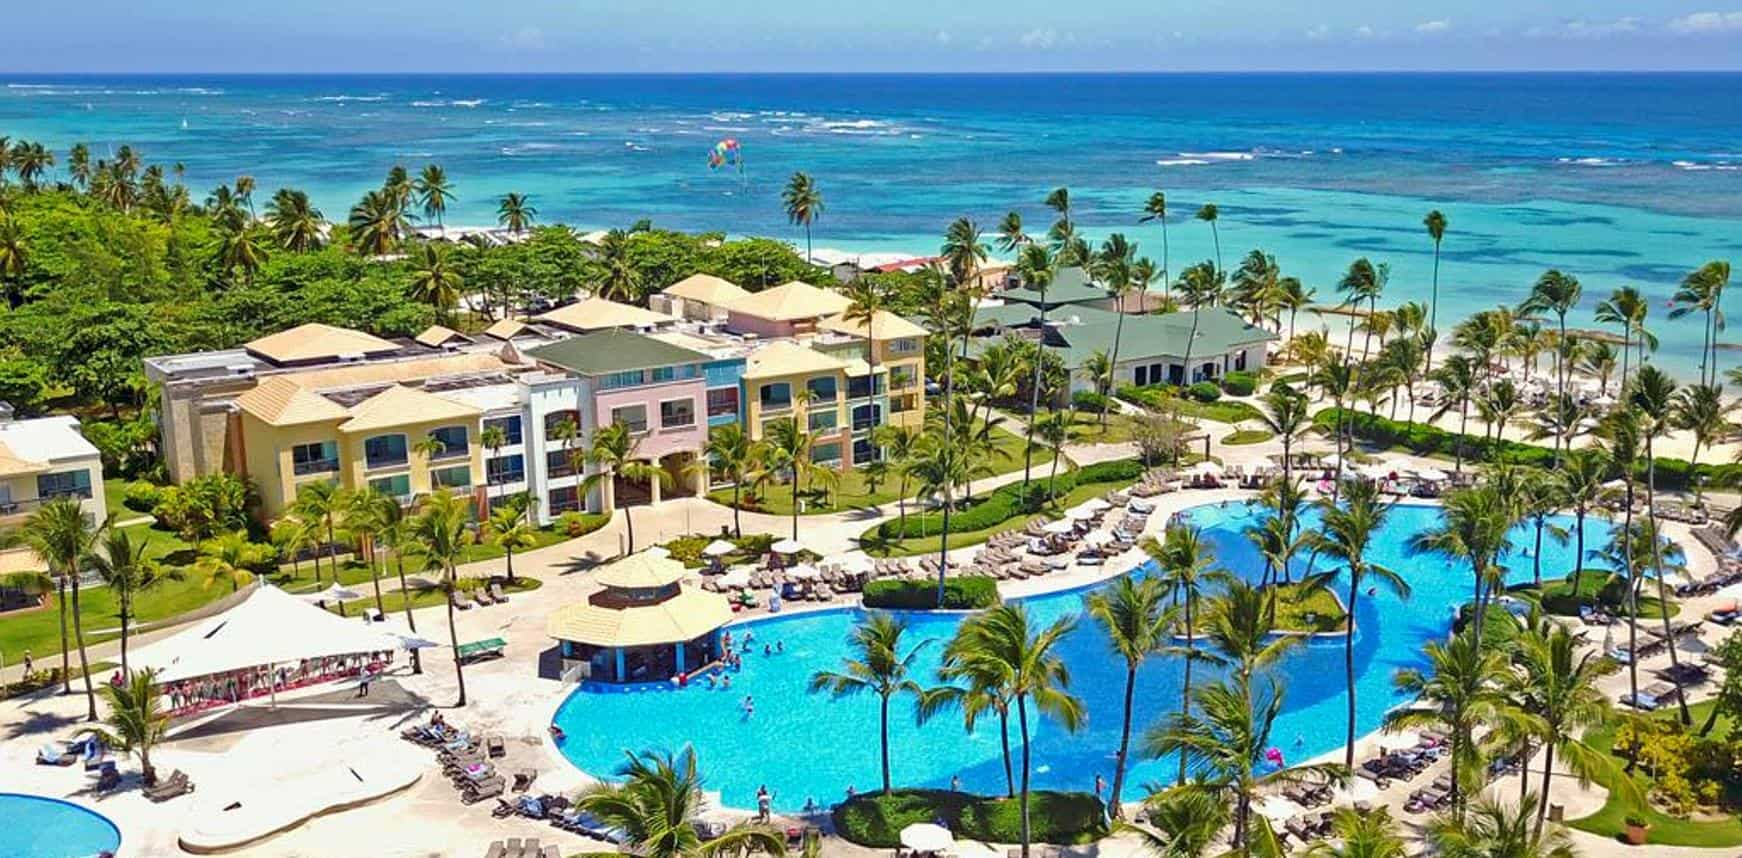 Ocean Blue Beach Resort